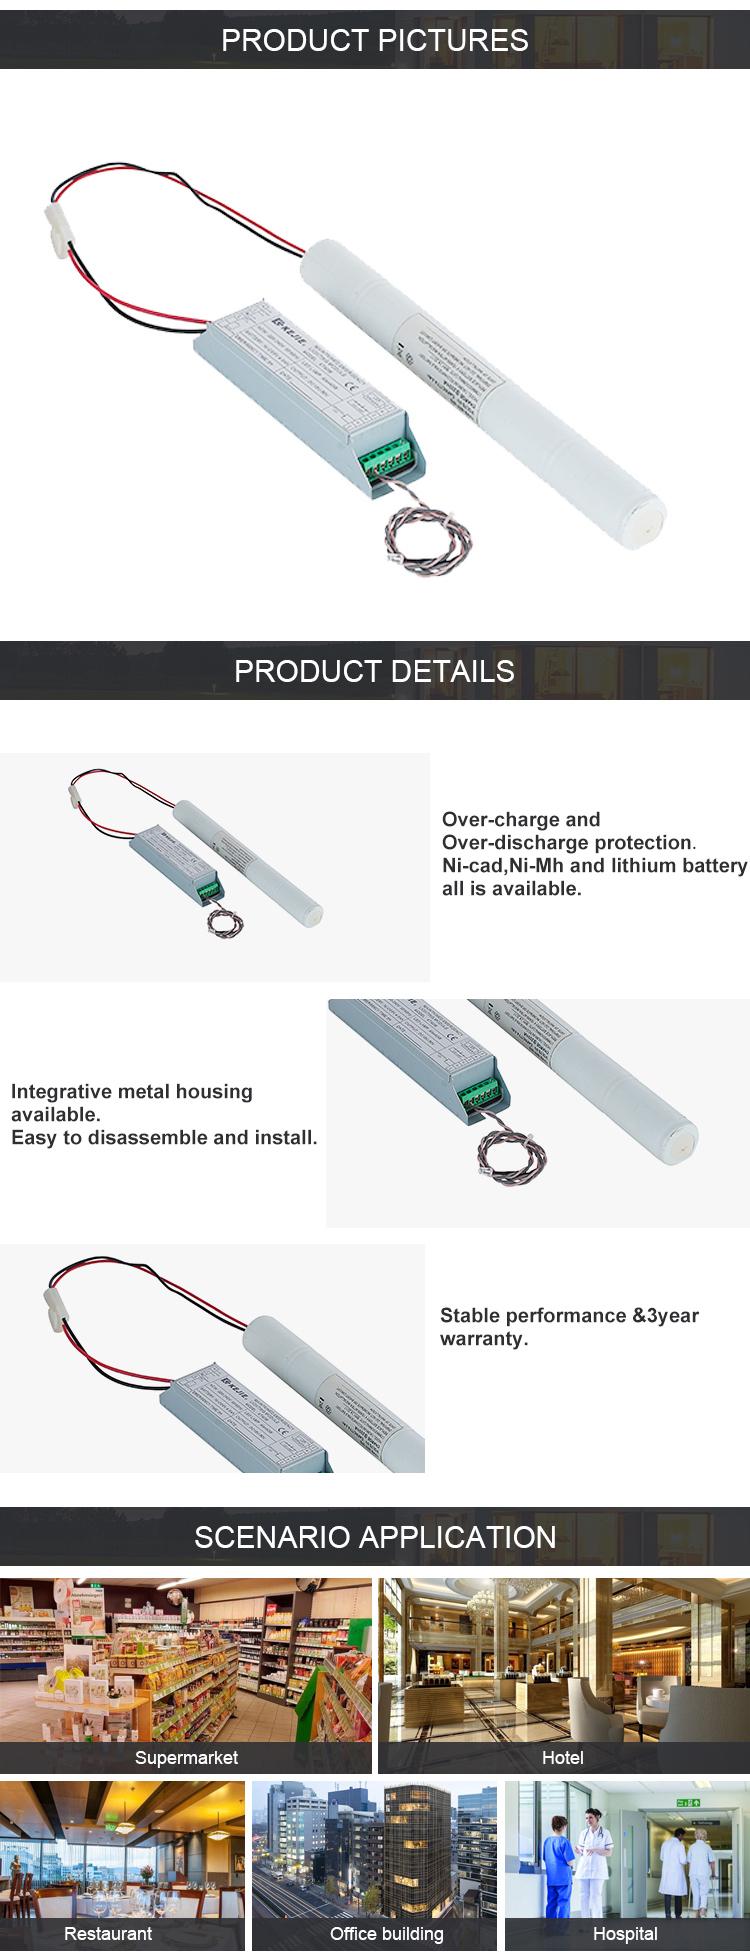 2020 heißesten 6 W-72 W led panel/downlight notfall power pack led notfall conversion kit mit 3 jahre garantie